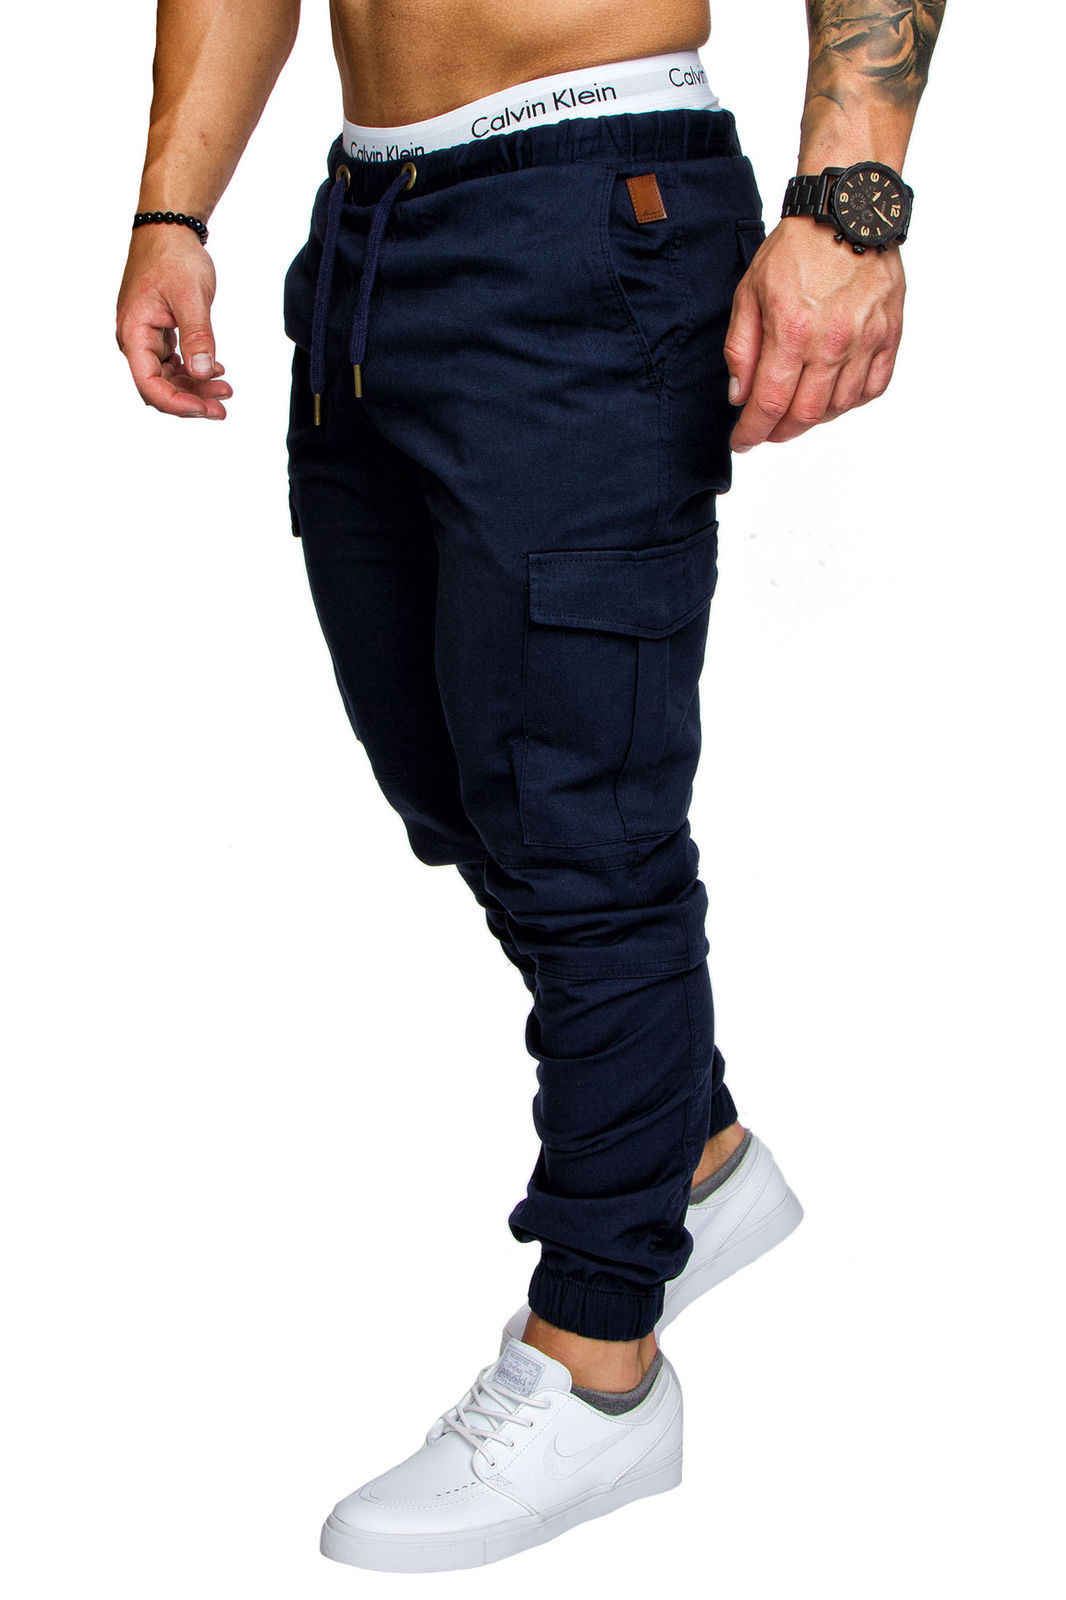 2018 sıcak tarzı takım rahat pantolon cep erkek dokuma kumaş askeri taktik pantolon streetwear sweatpants kargo pantolon